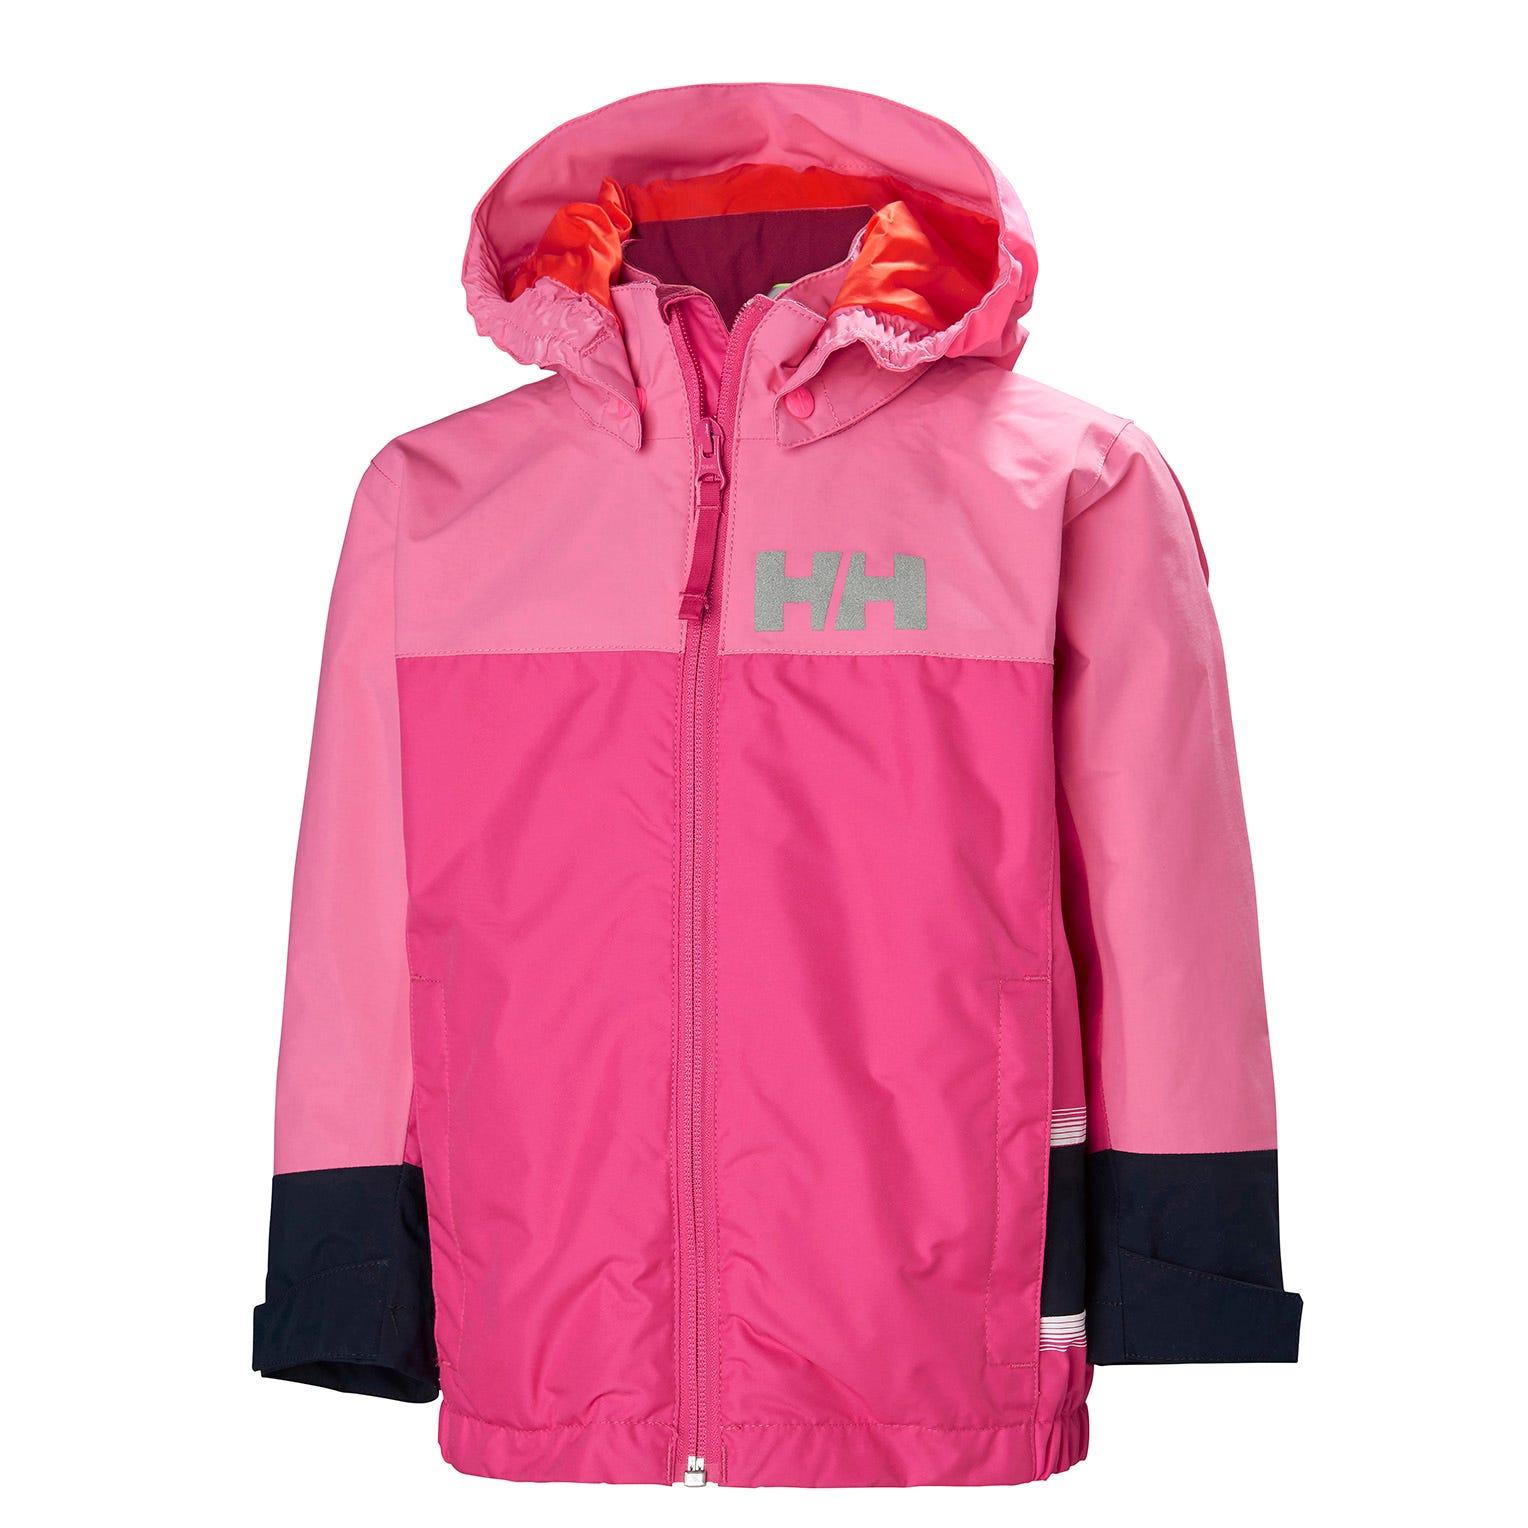 Helly Hansen Kids Norse Jacket Parka Pink 104/4